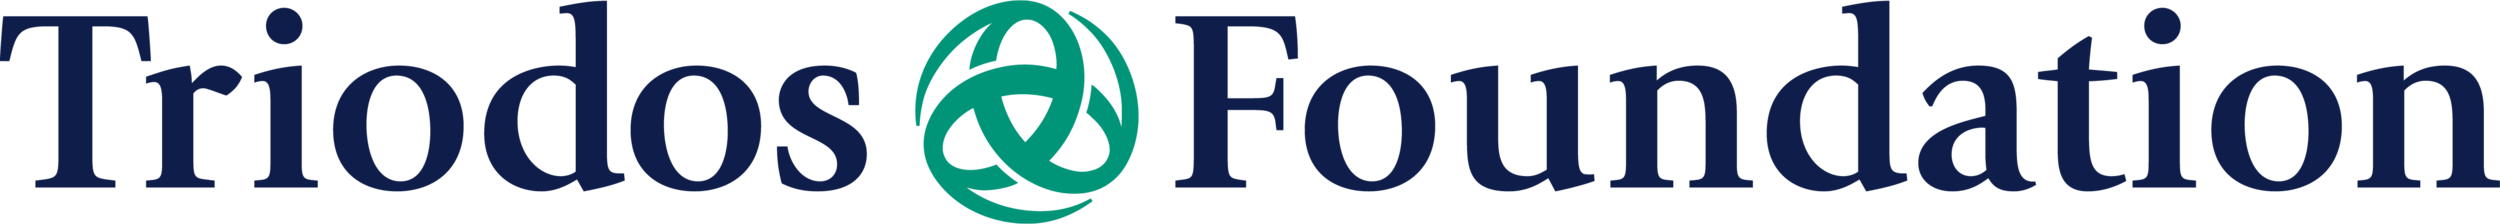 Triodos-Foundation logo_RGB_online.png